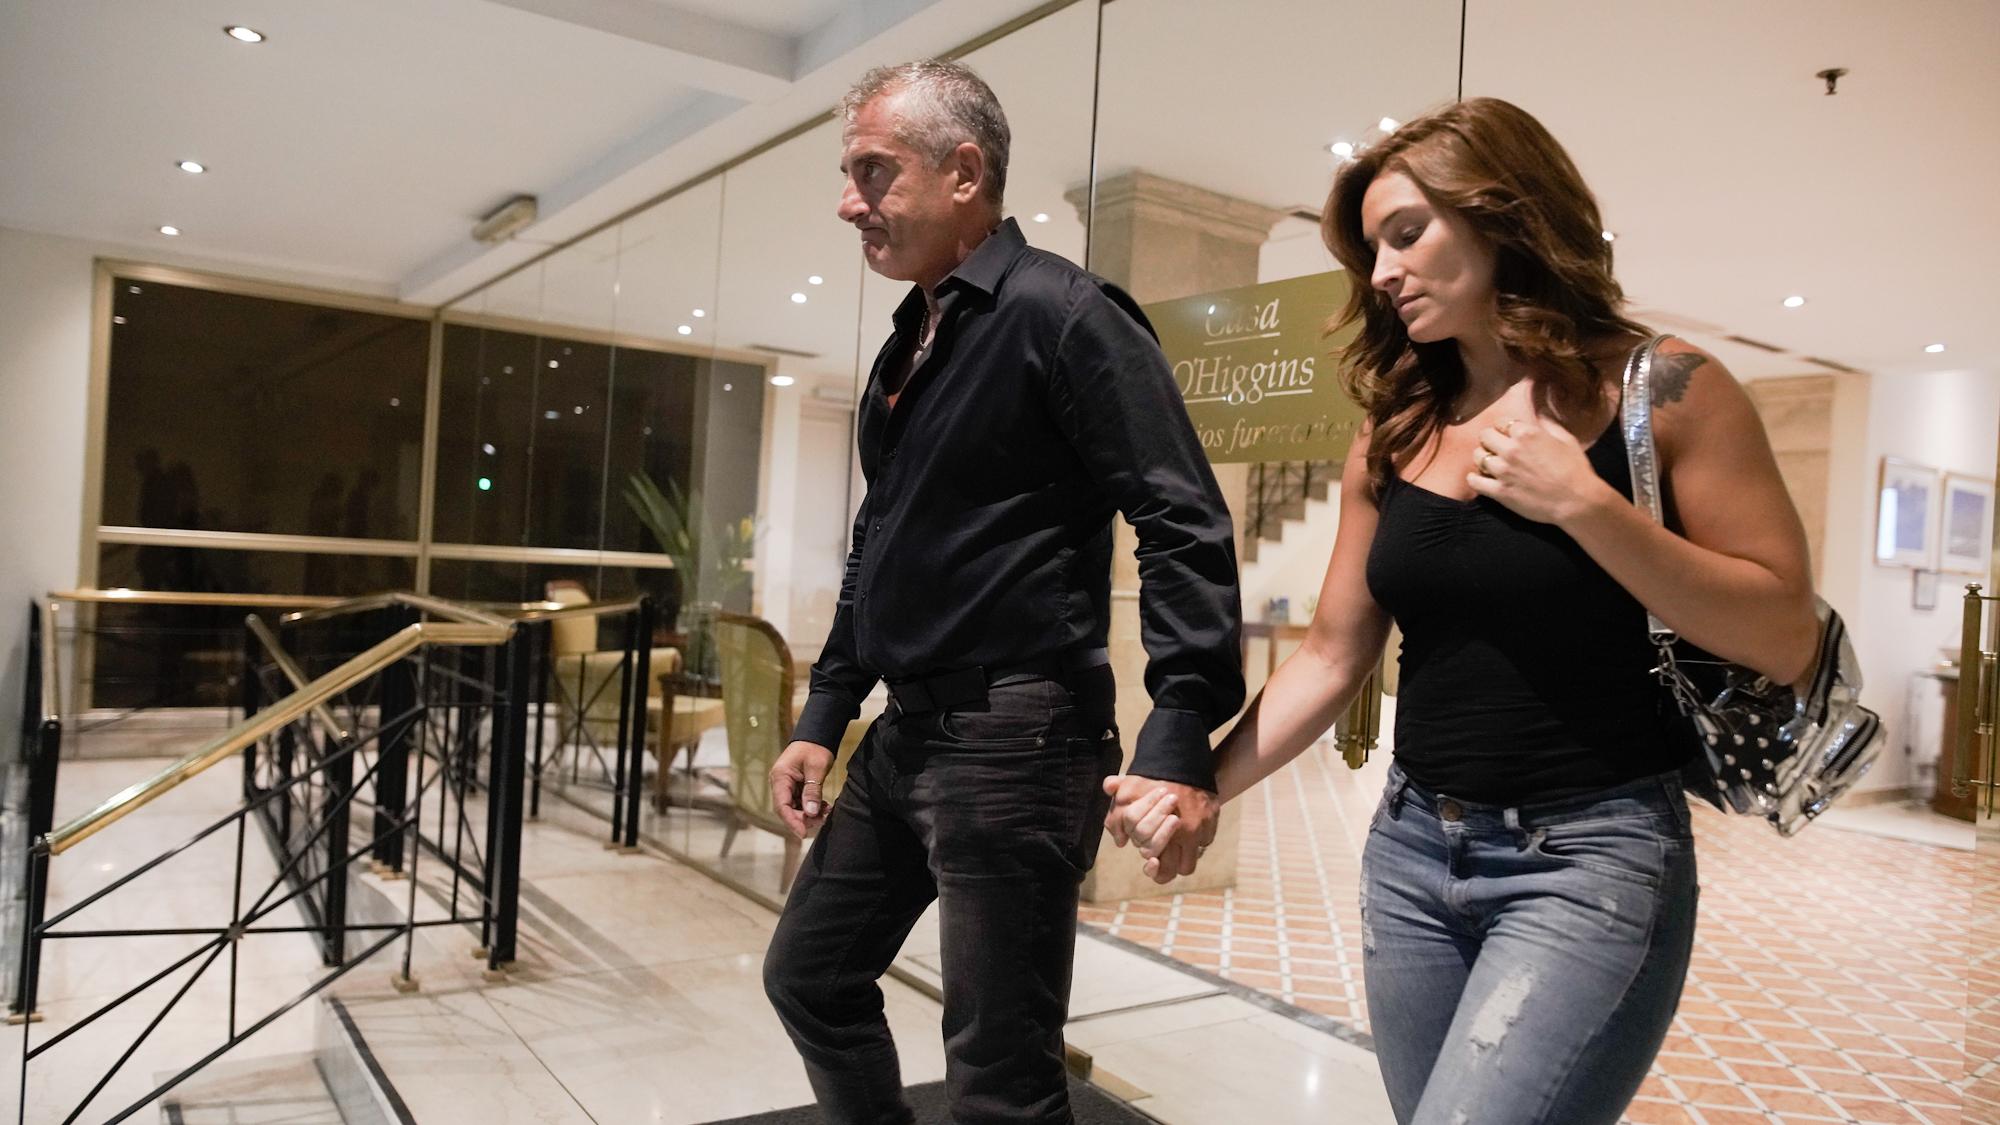 Omar Suárez y Denise Cerrone